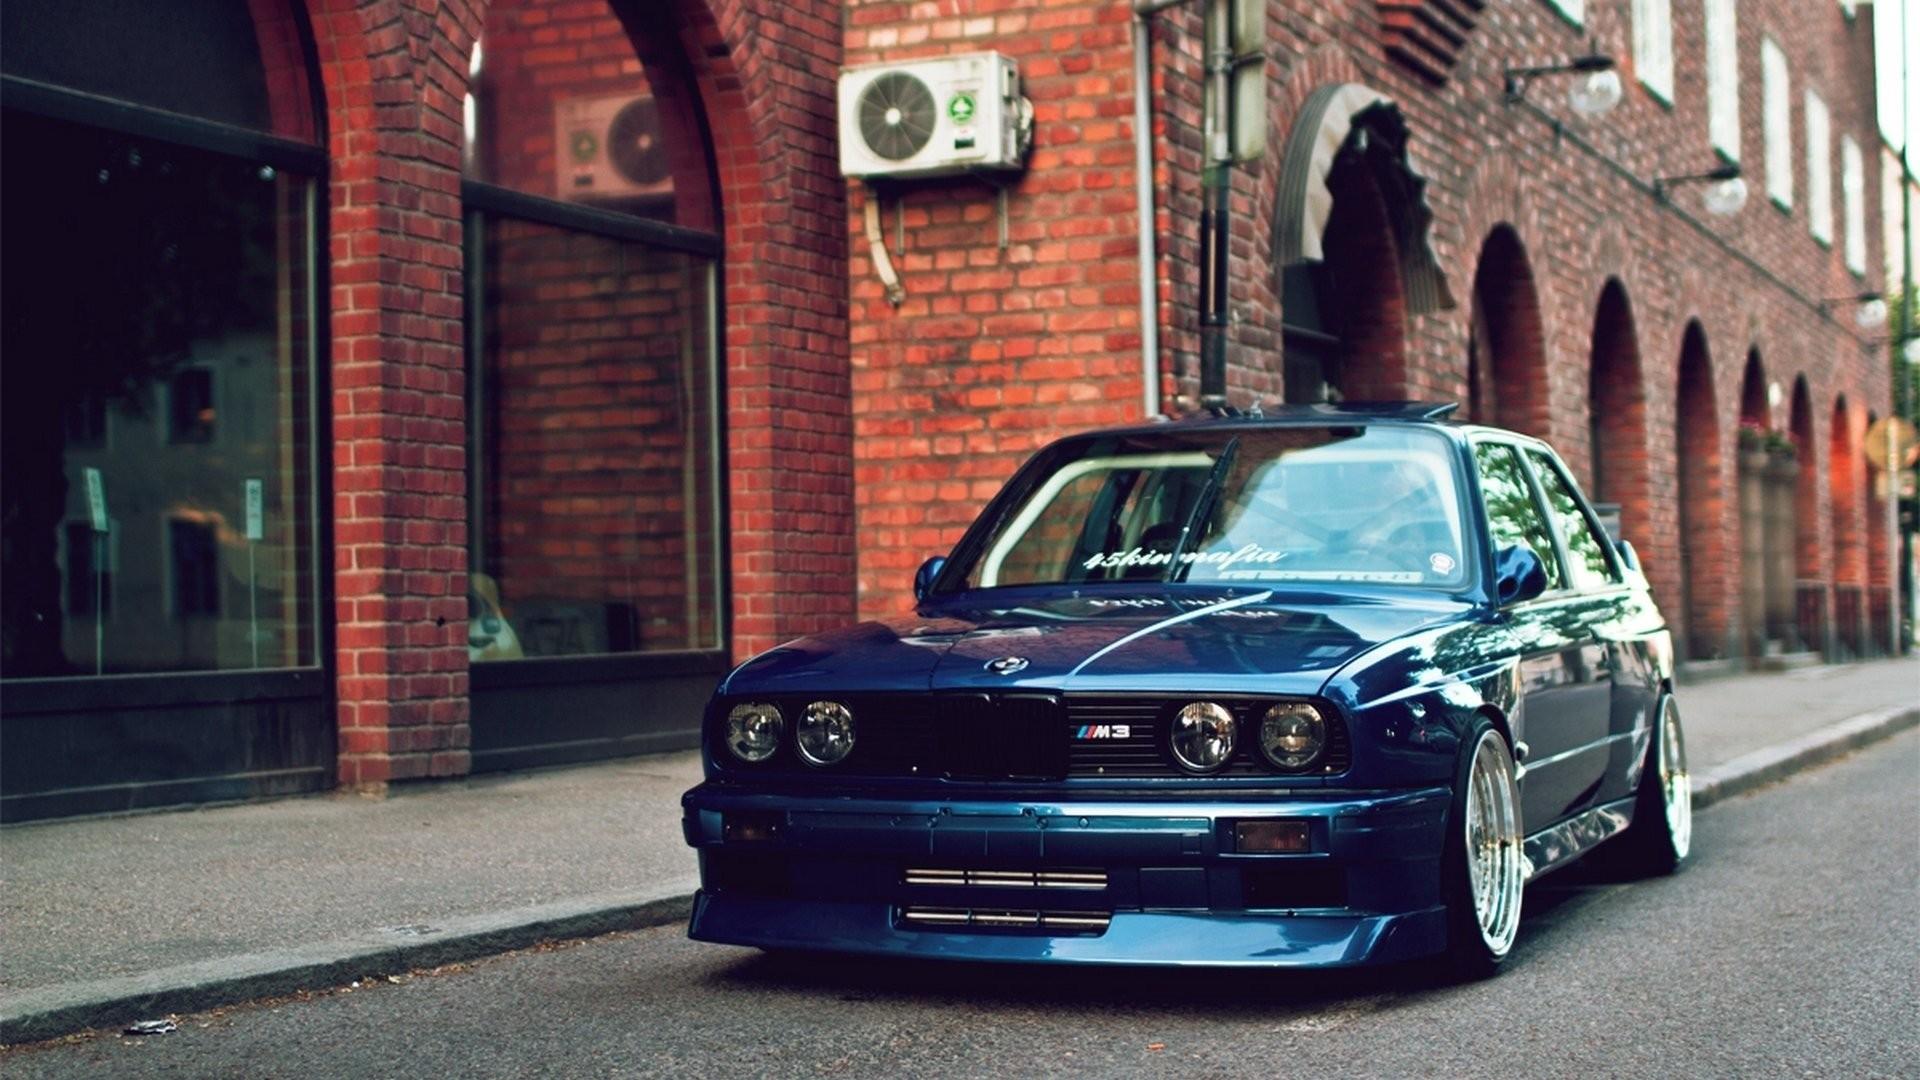 Res: 1920x1080, Cars BMW M3 BMW E30 wallpaper 2560x1600 283573 WallpaperUP - HD Wallpapers